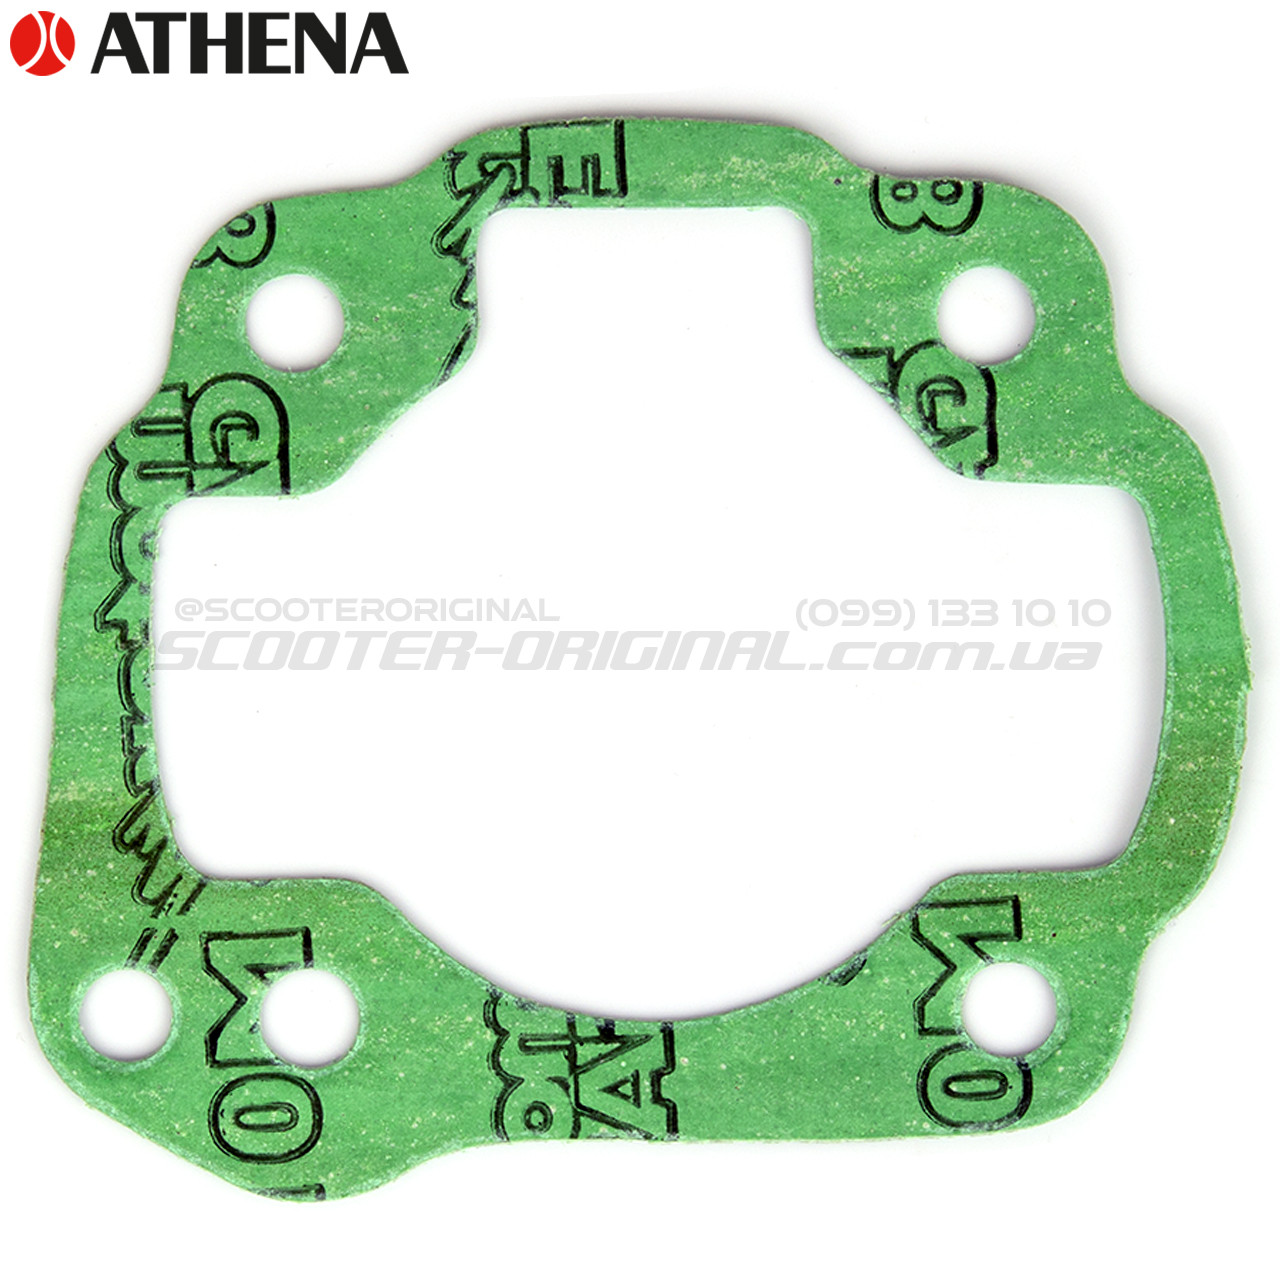 Прокладка под цилиндр ATHENA Minarelli Horizontal (Yamaha)